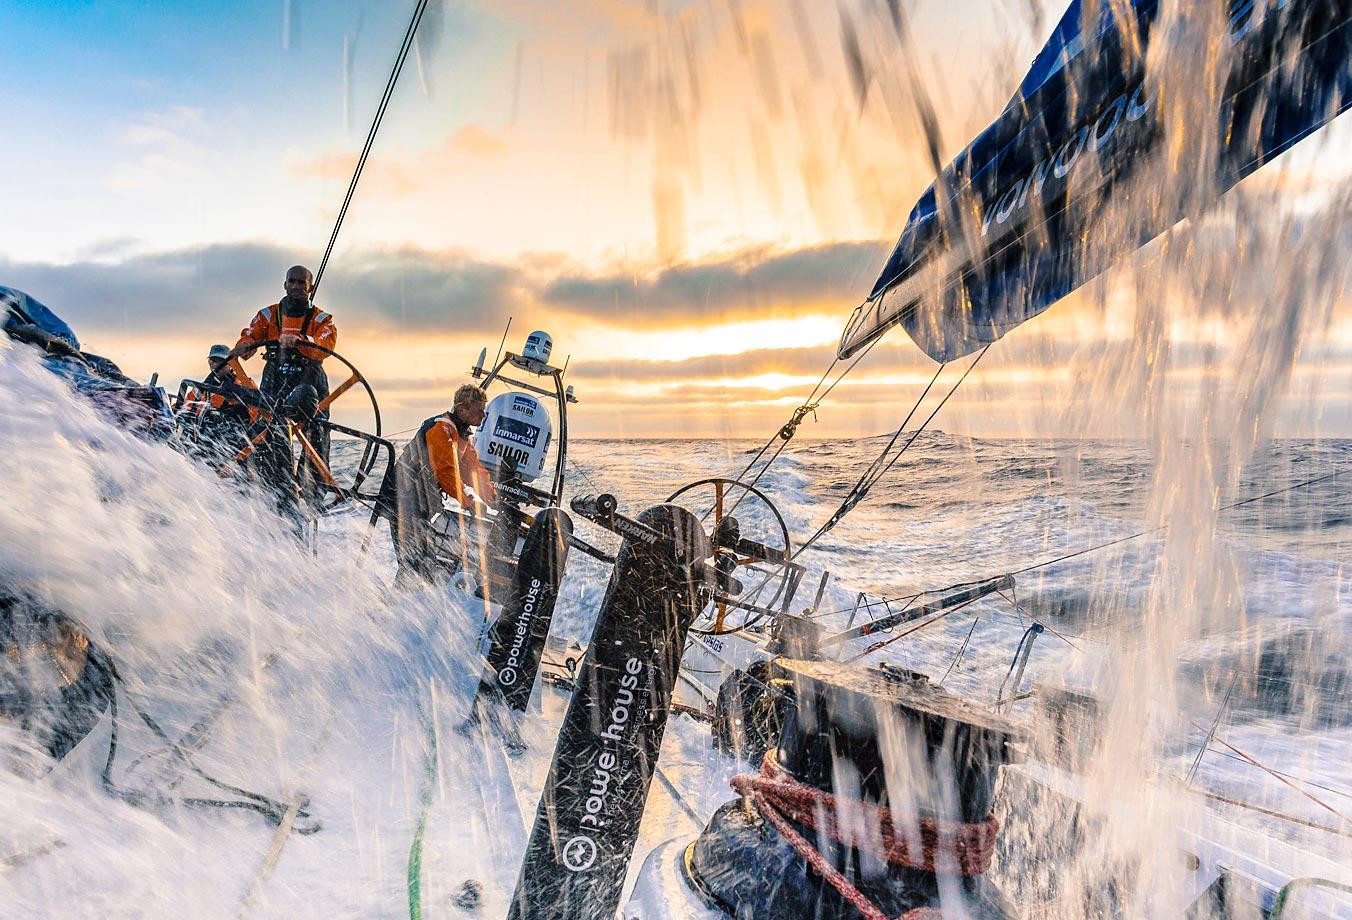 The Volvo Ocean Race 2014-15 is the 12th running of the ocean marathon.